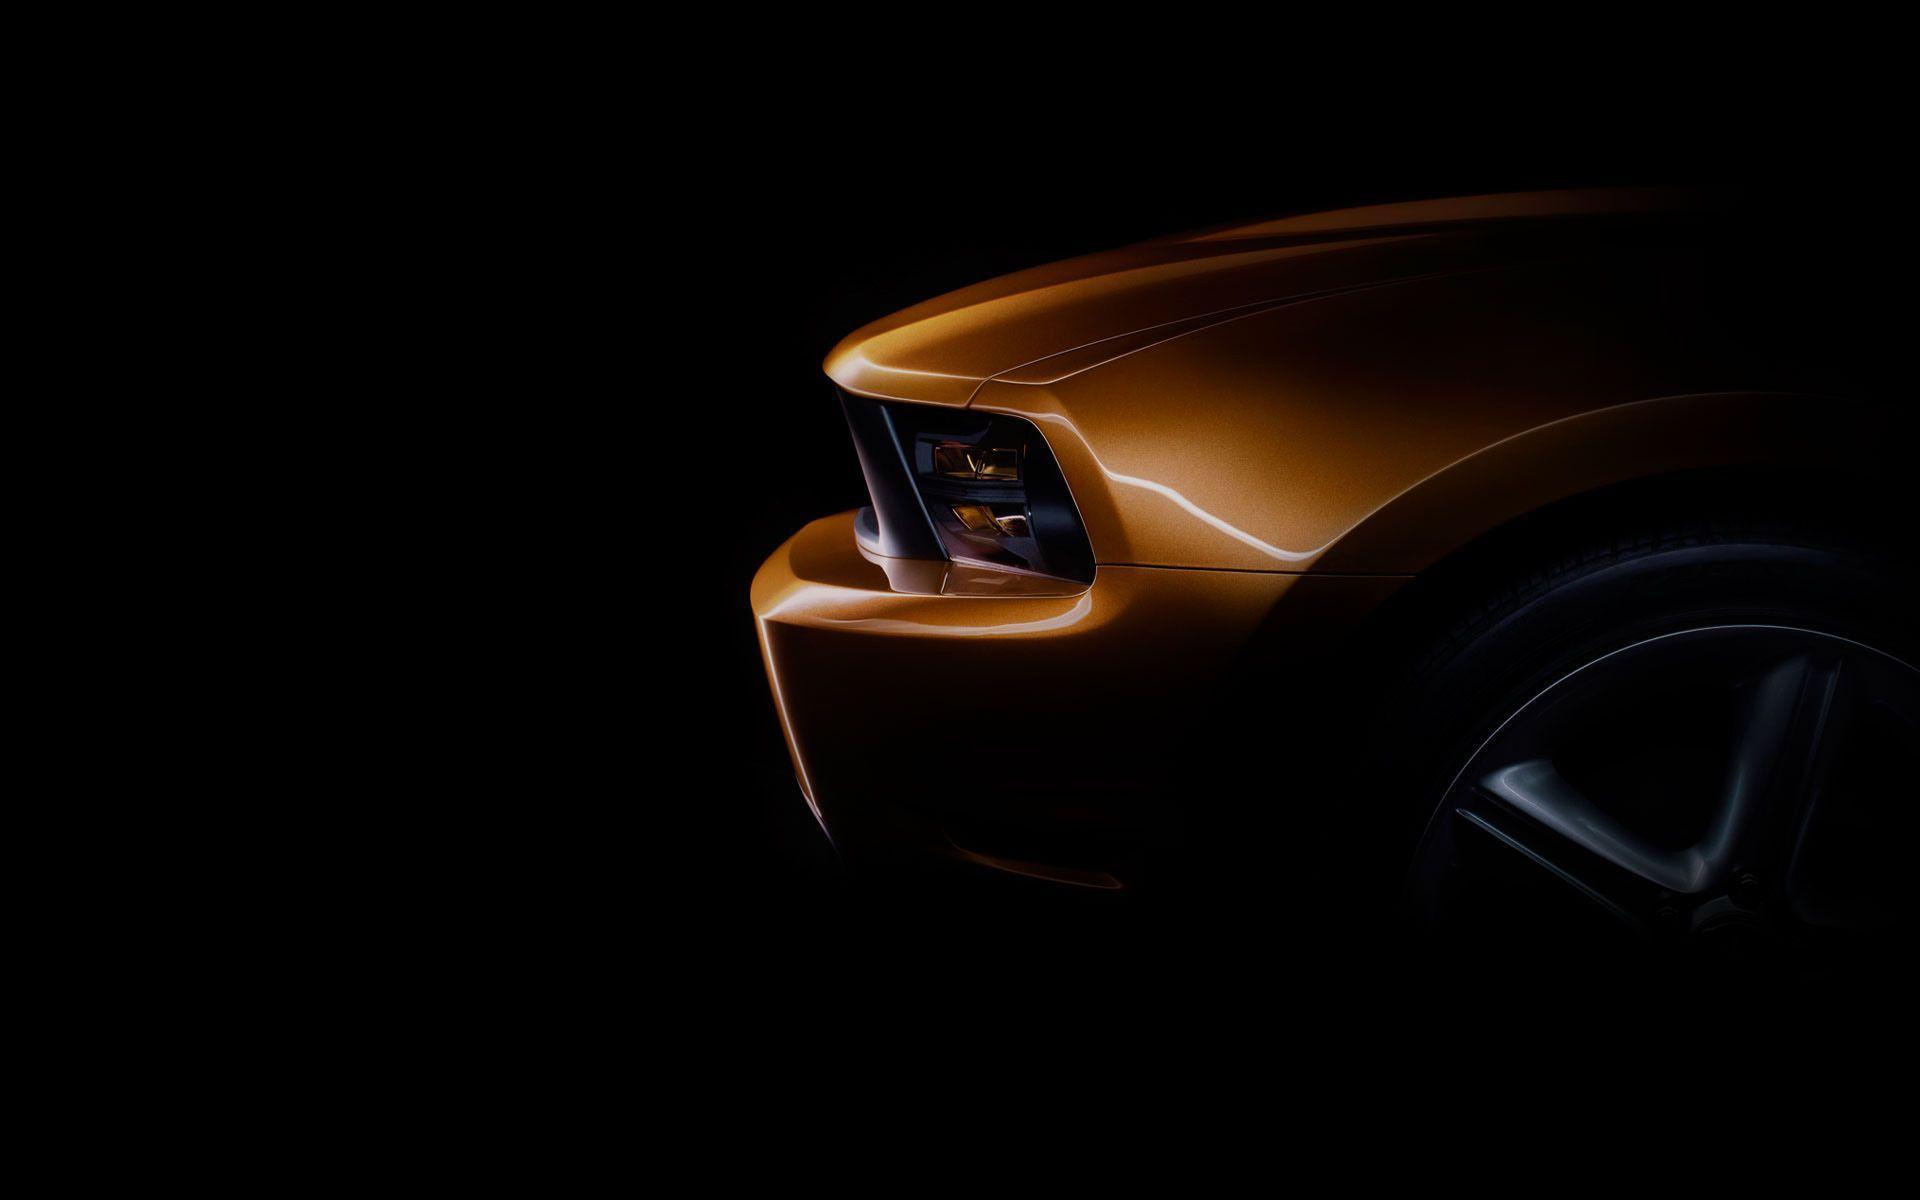 Ford Mustang Desktop Wallpaper